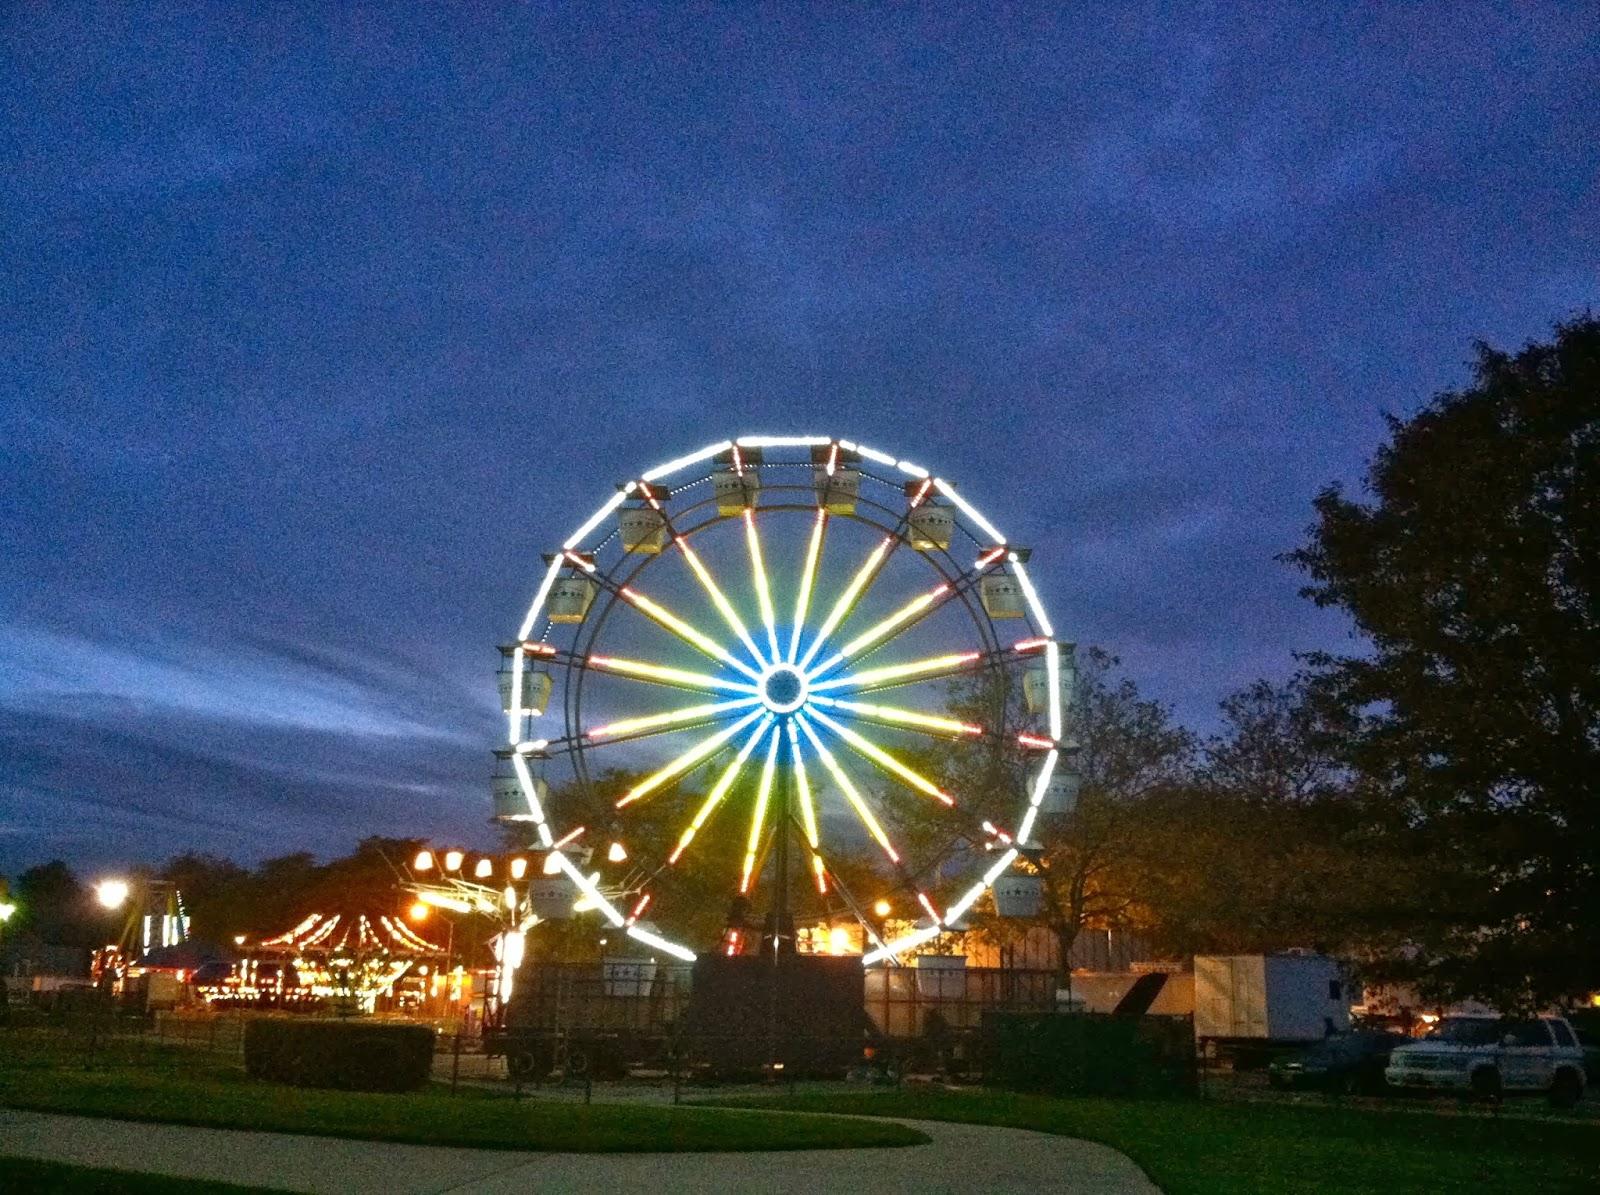 Ferris Wheel Costume The-ferris-wheel-at-the